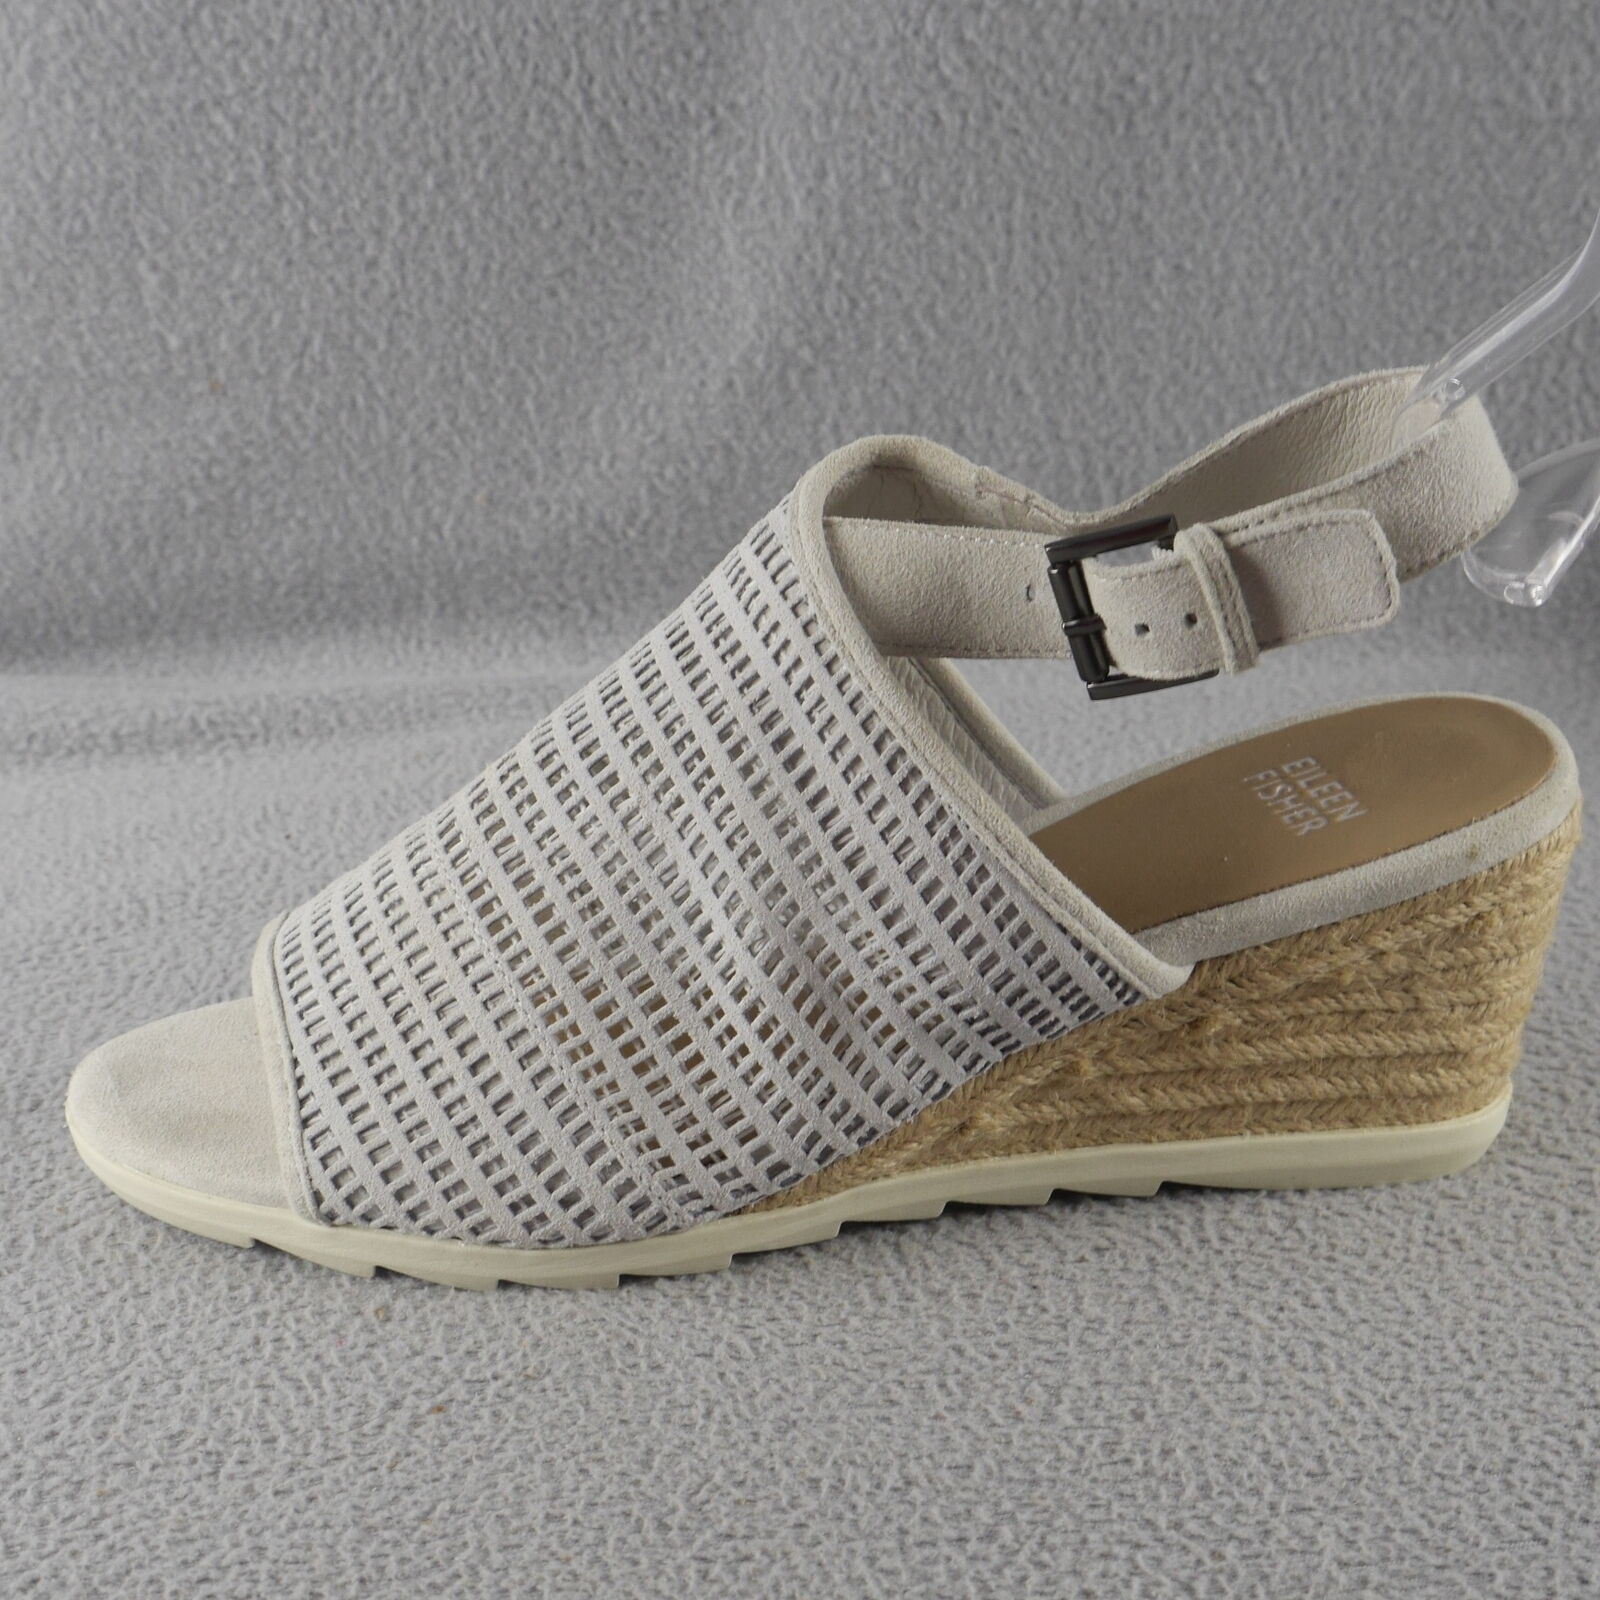 Eileen Fisher AURA Women's Suede Mesh Espadrille Slingback Jute Wedge Sandal ANB